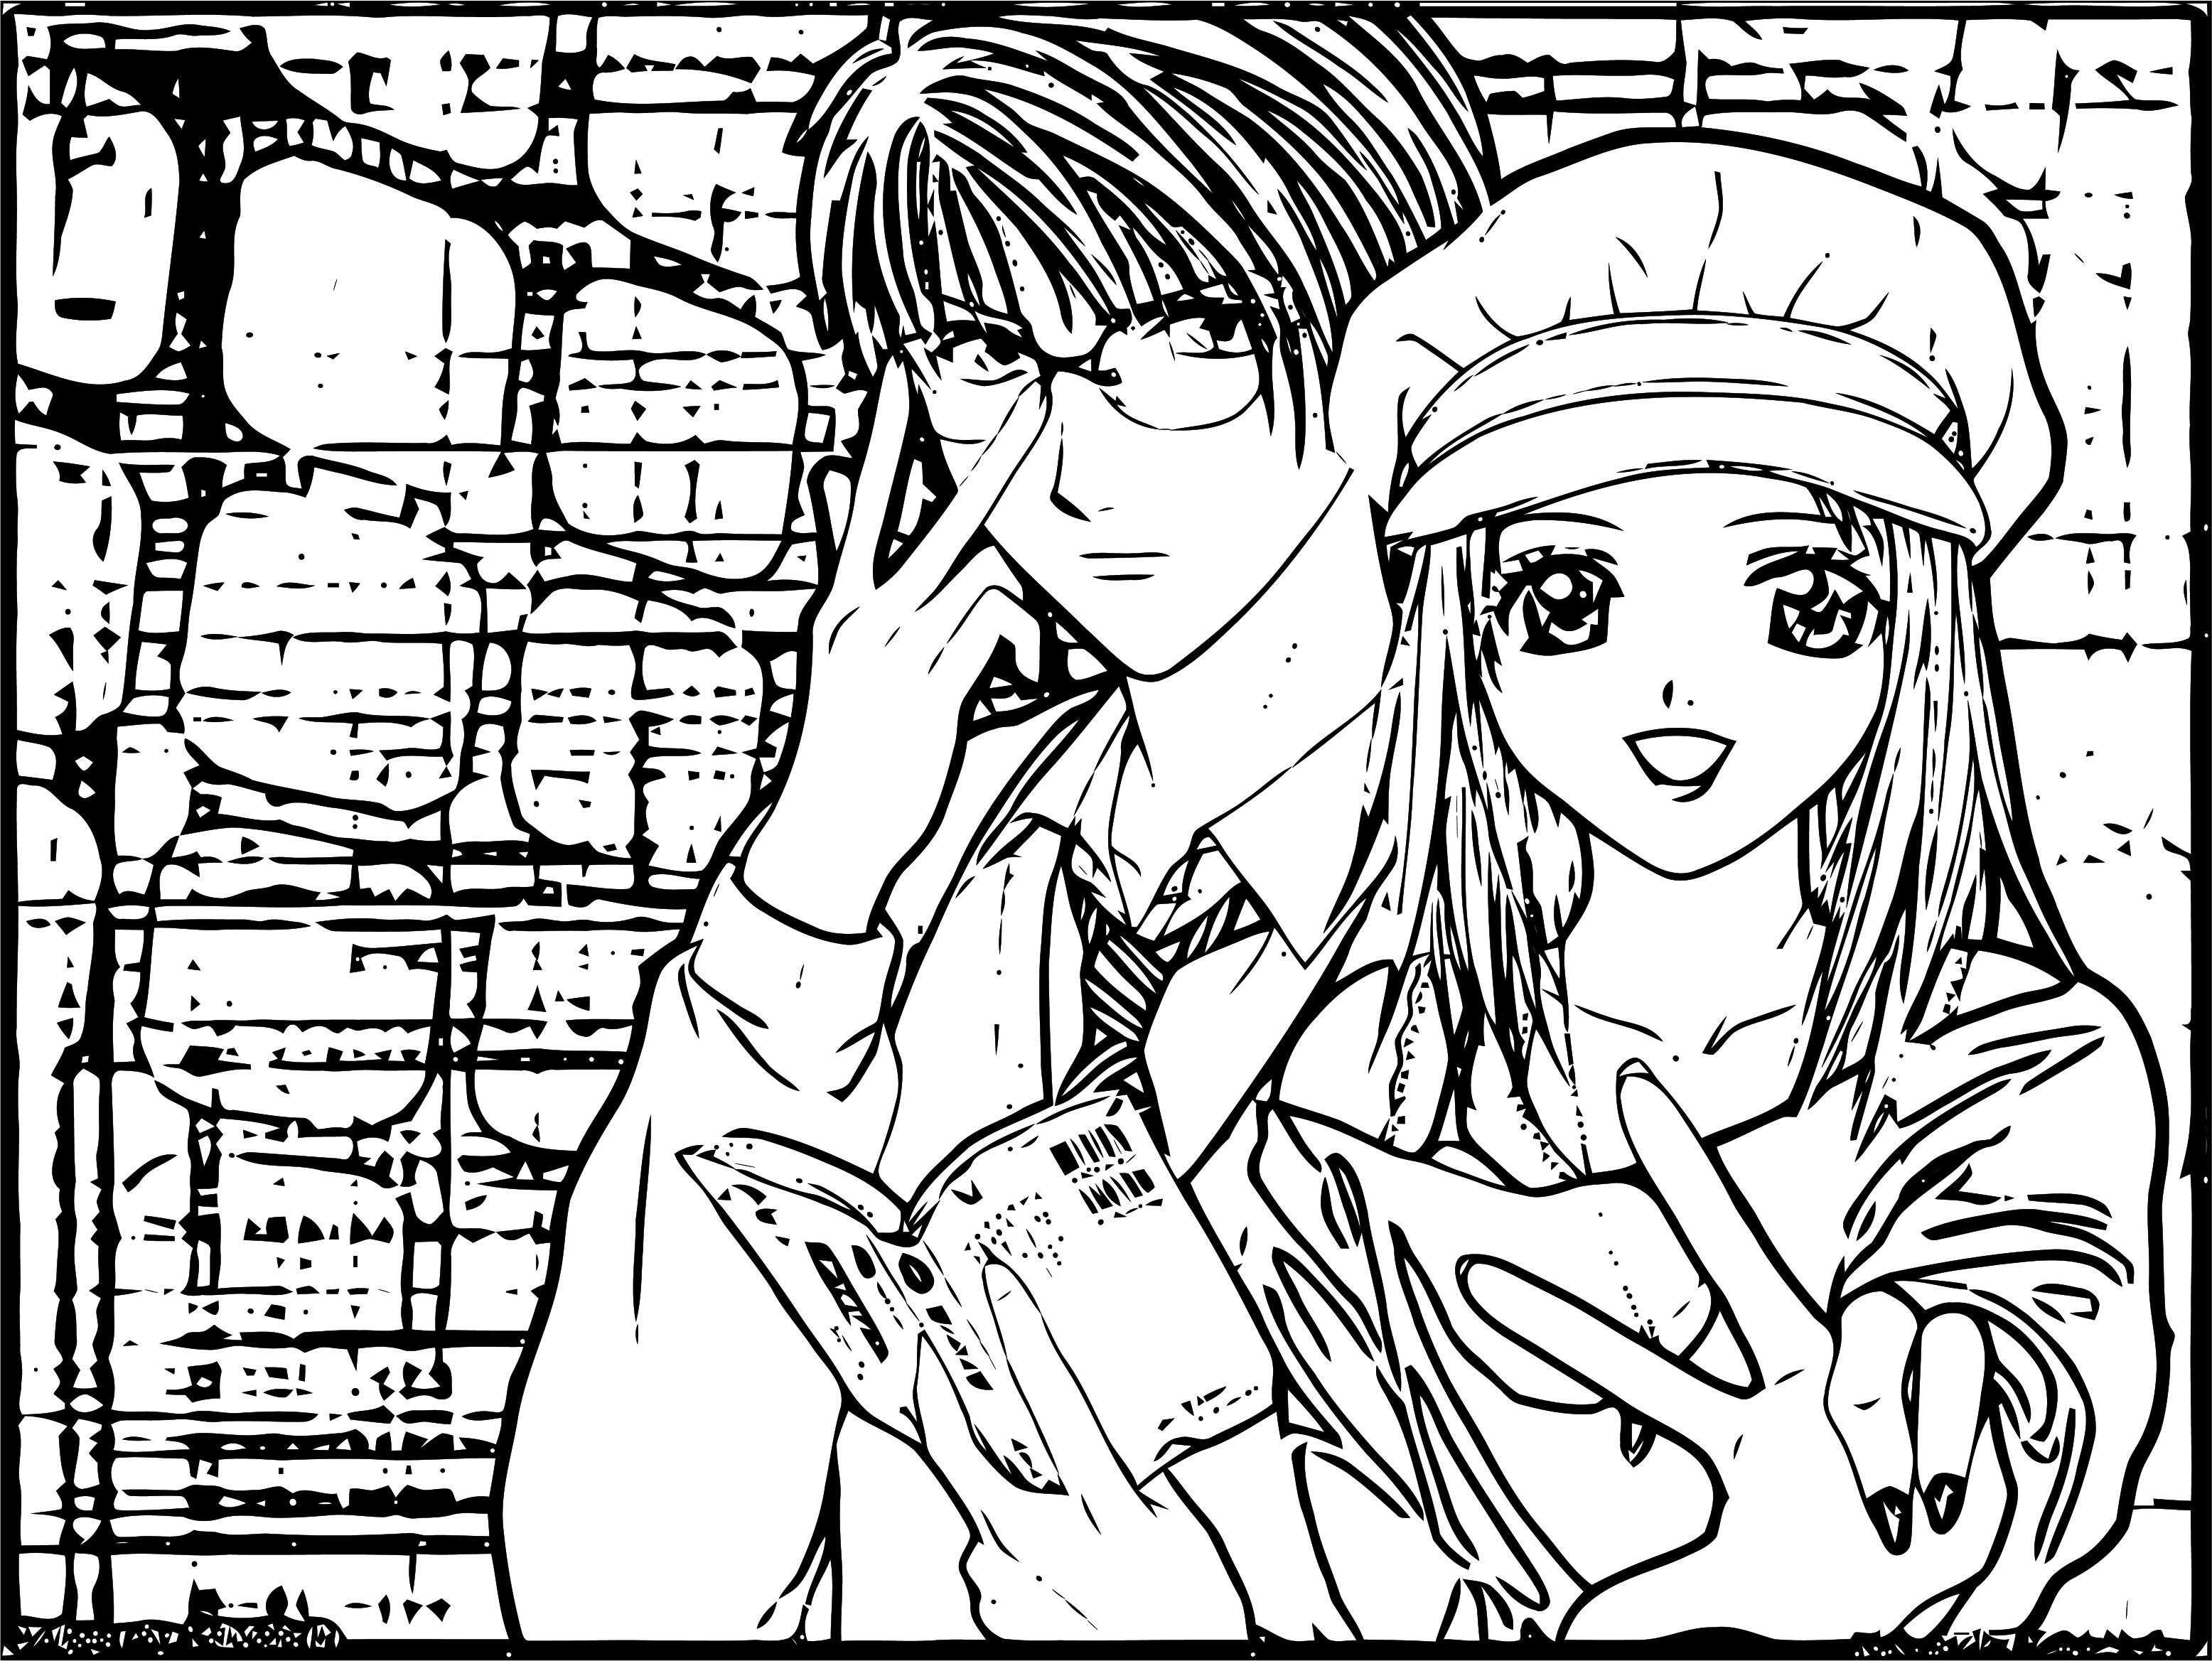 Manga Okey Girl Boy Coloring Page